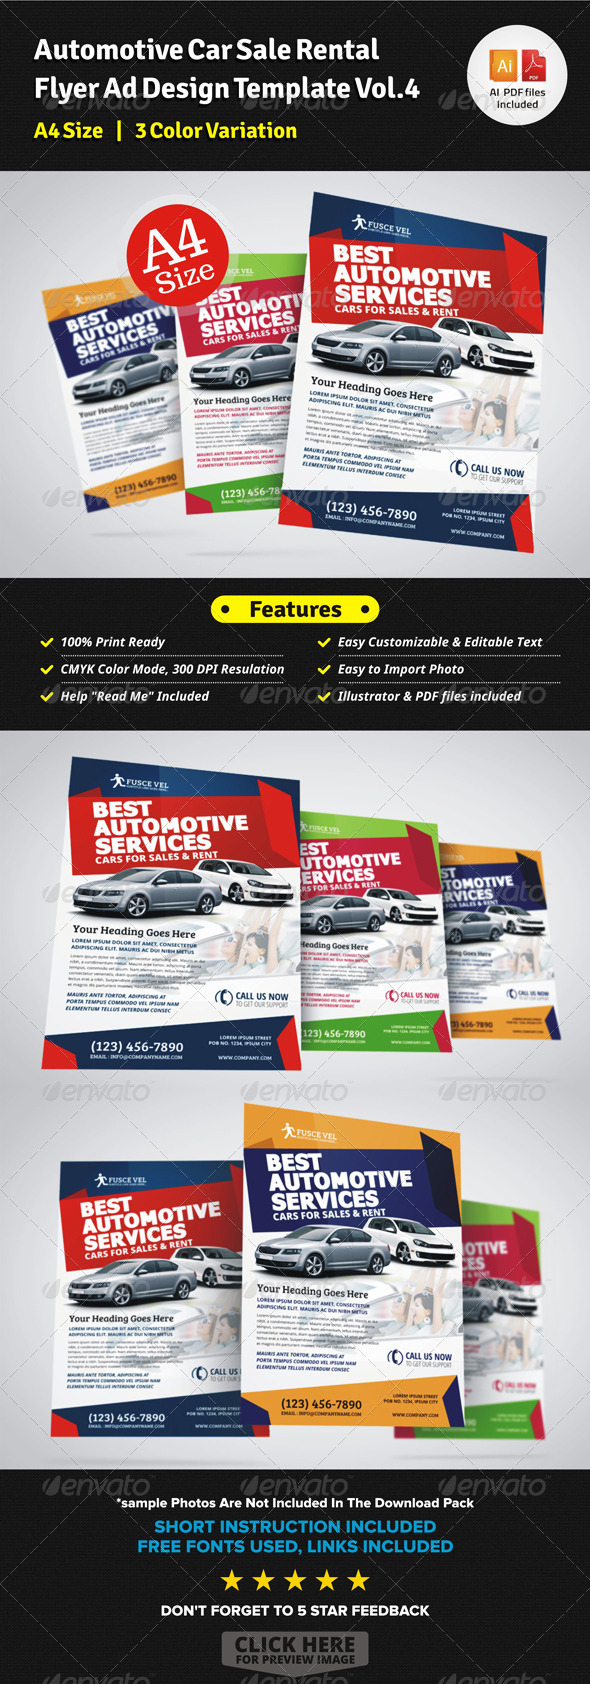 newspaper ad design templates newspaper ad design templates automotive car re